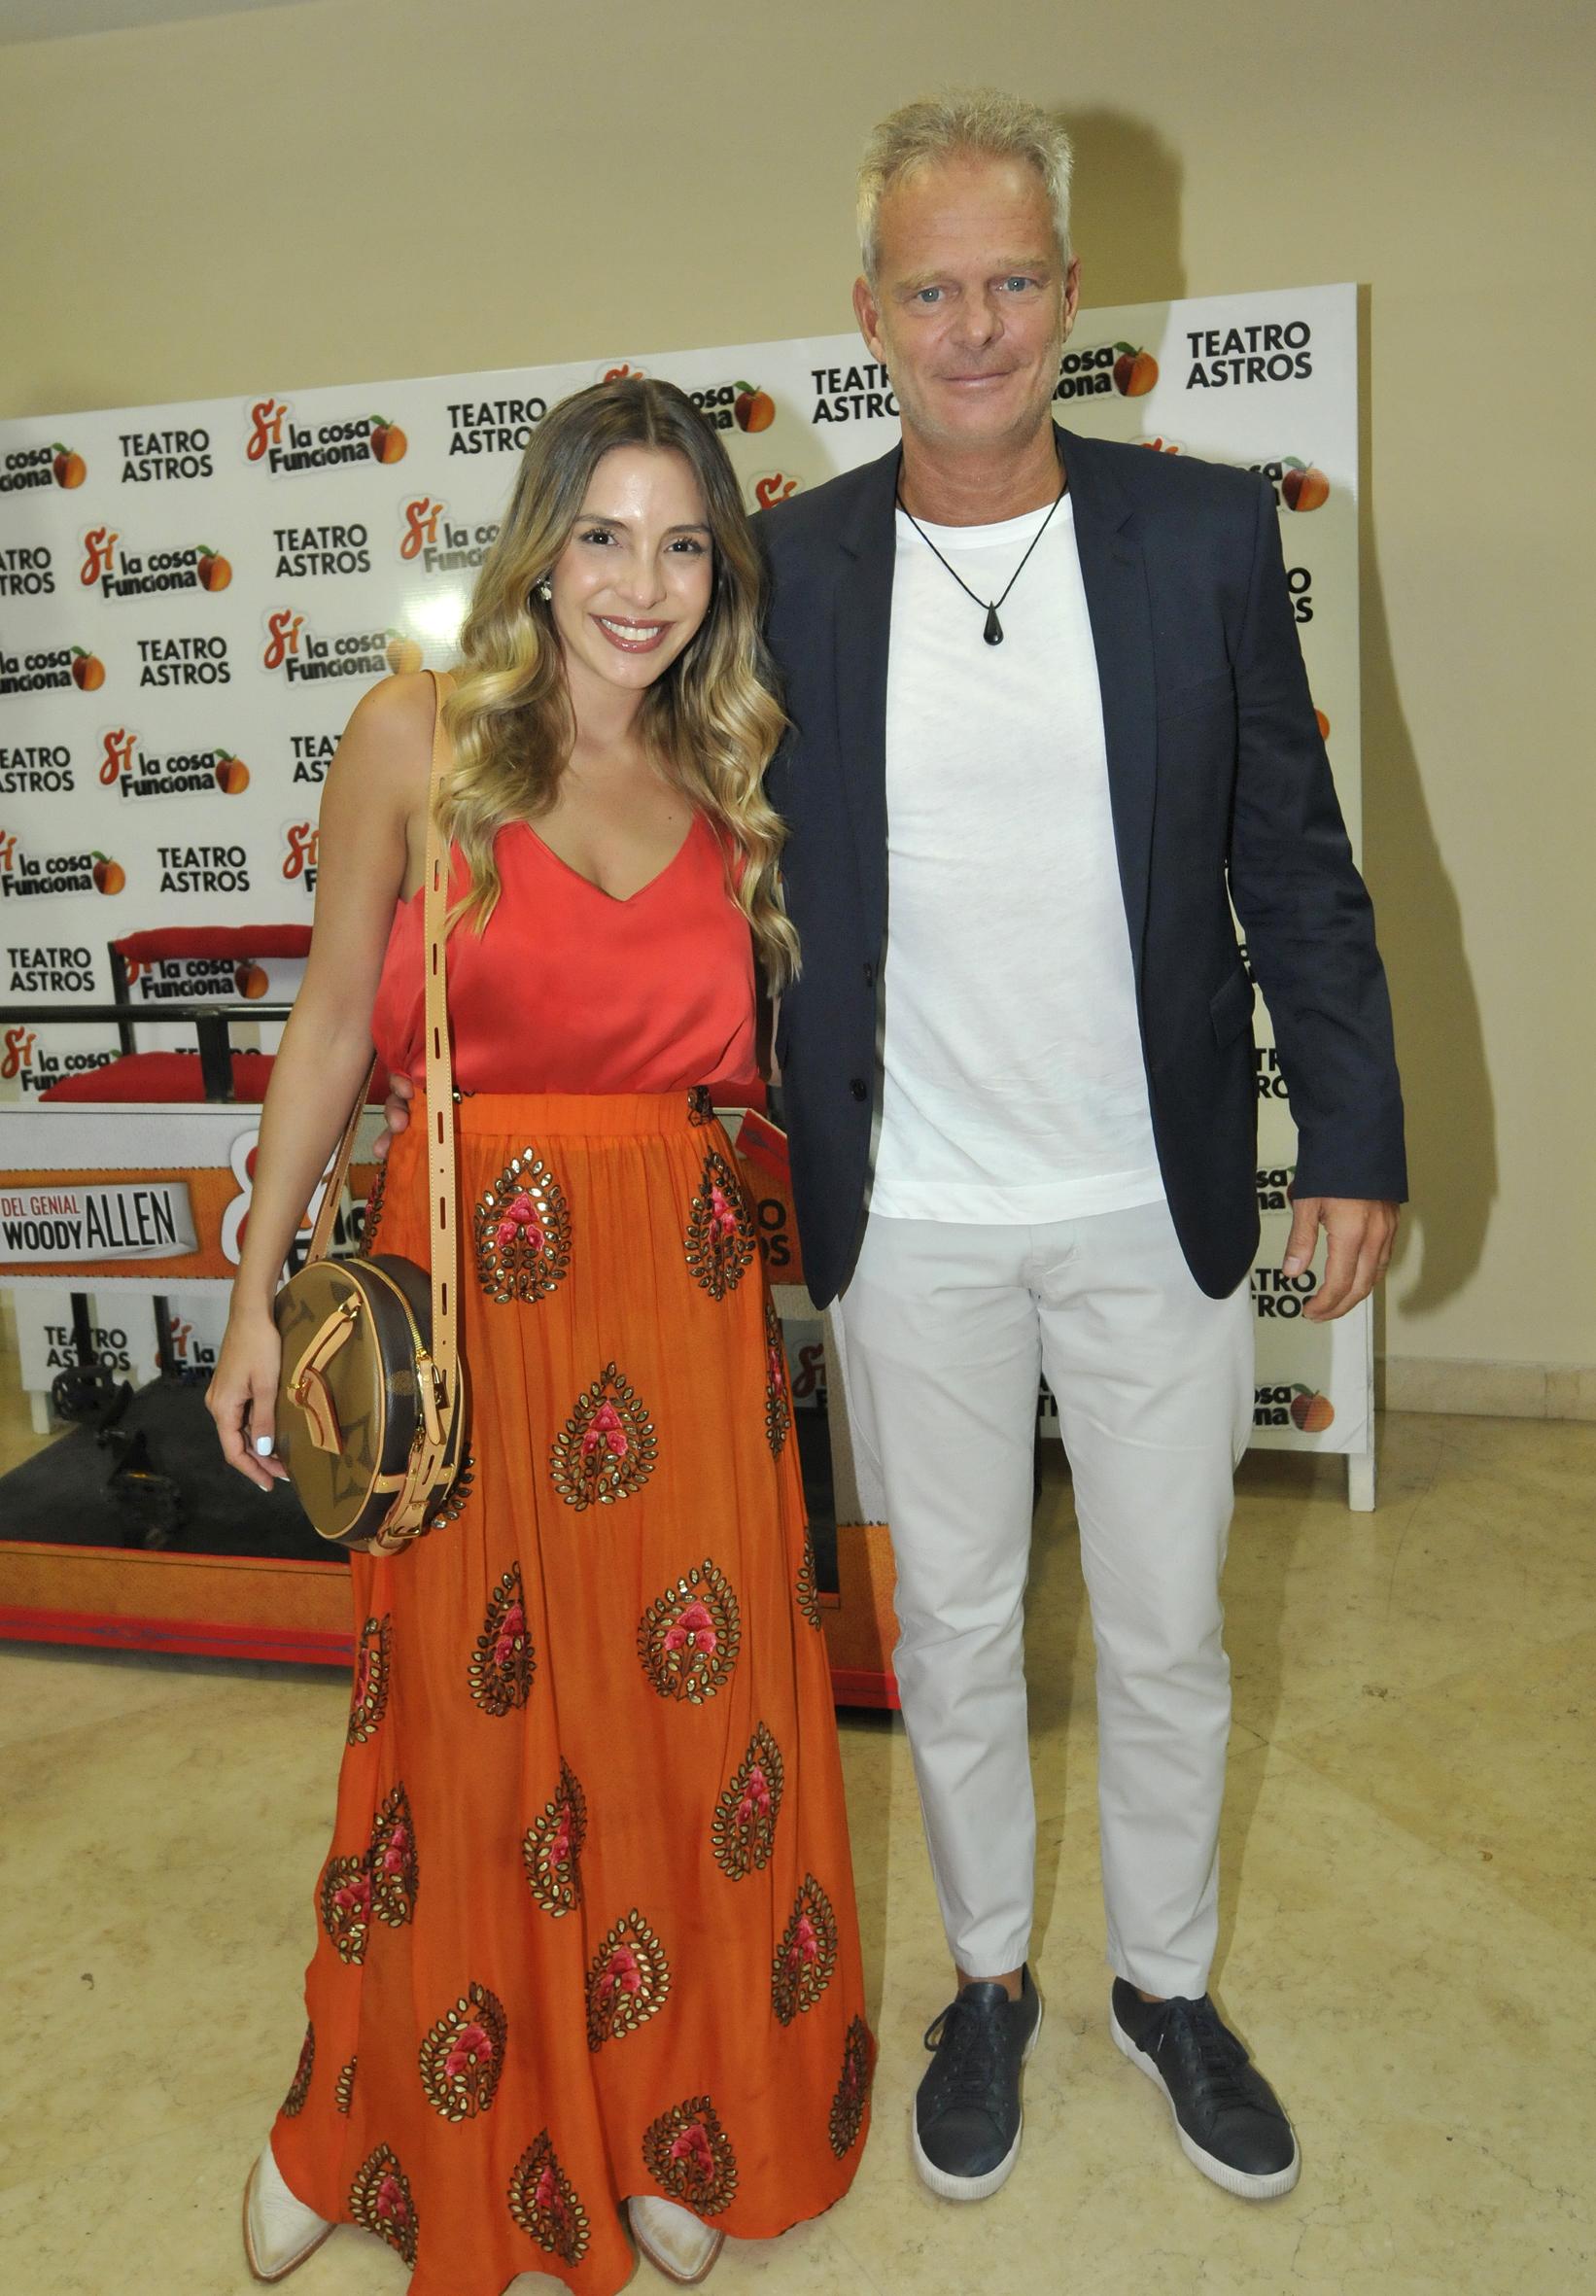 Luisa Drozdek y su marido Hernán Nisenbaum